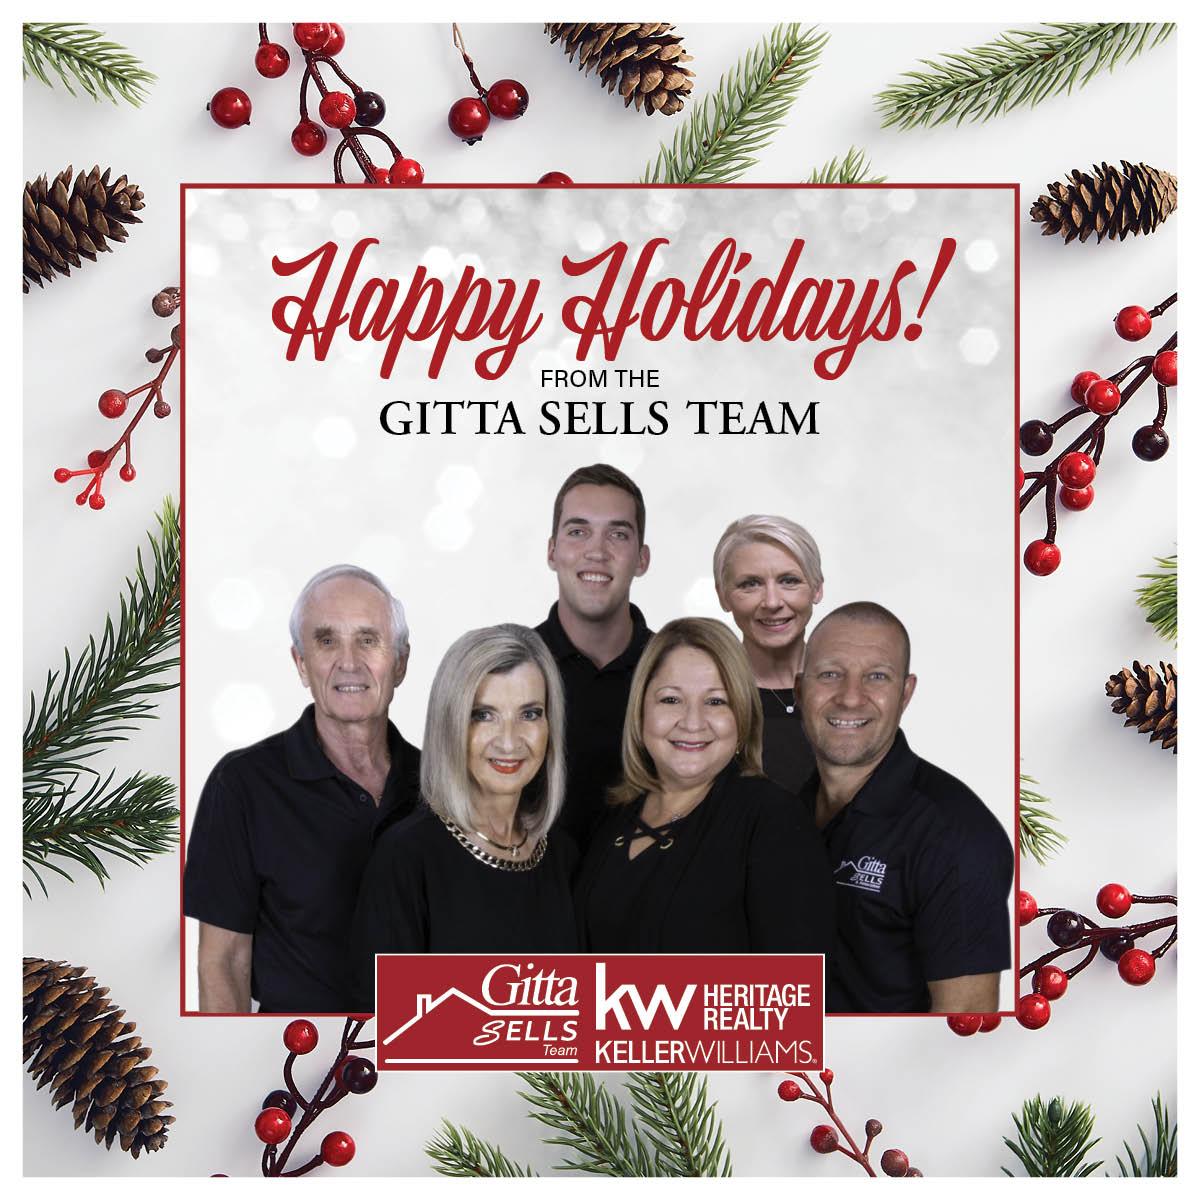 Happy holidays gitta sells